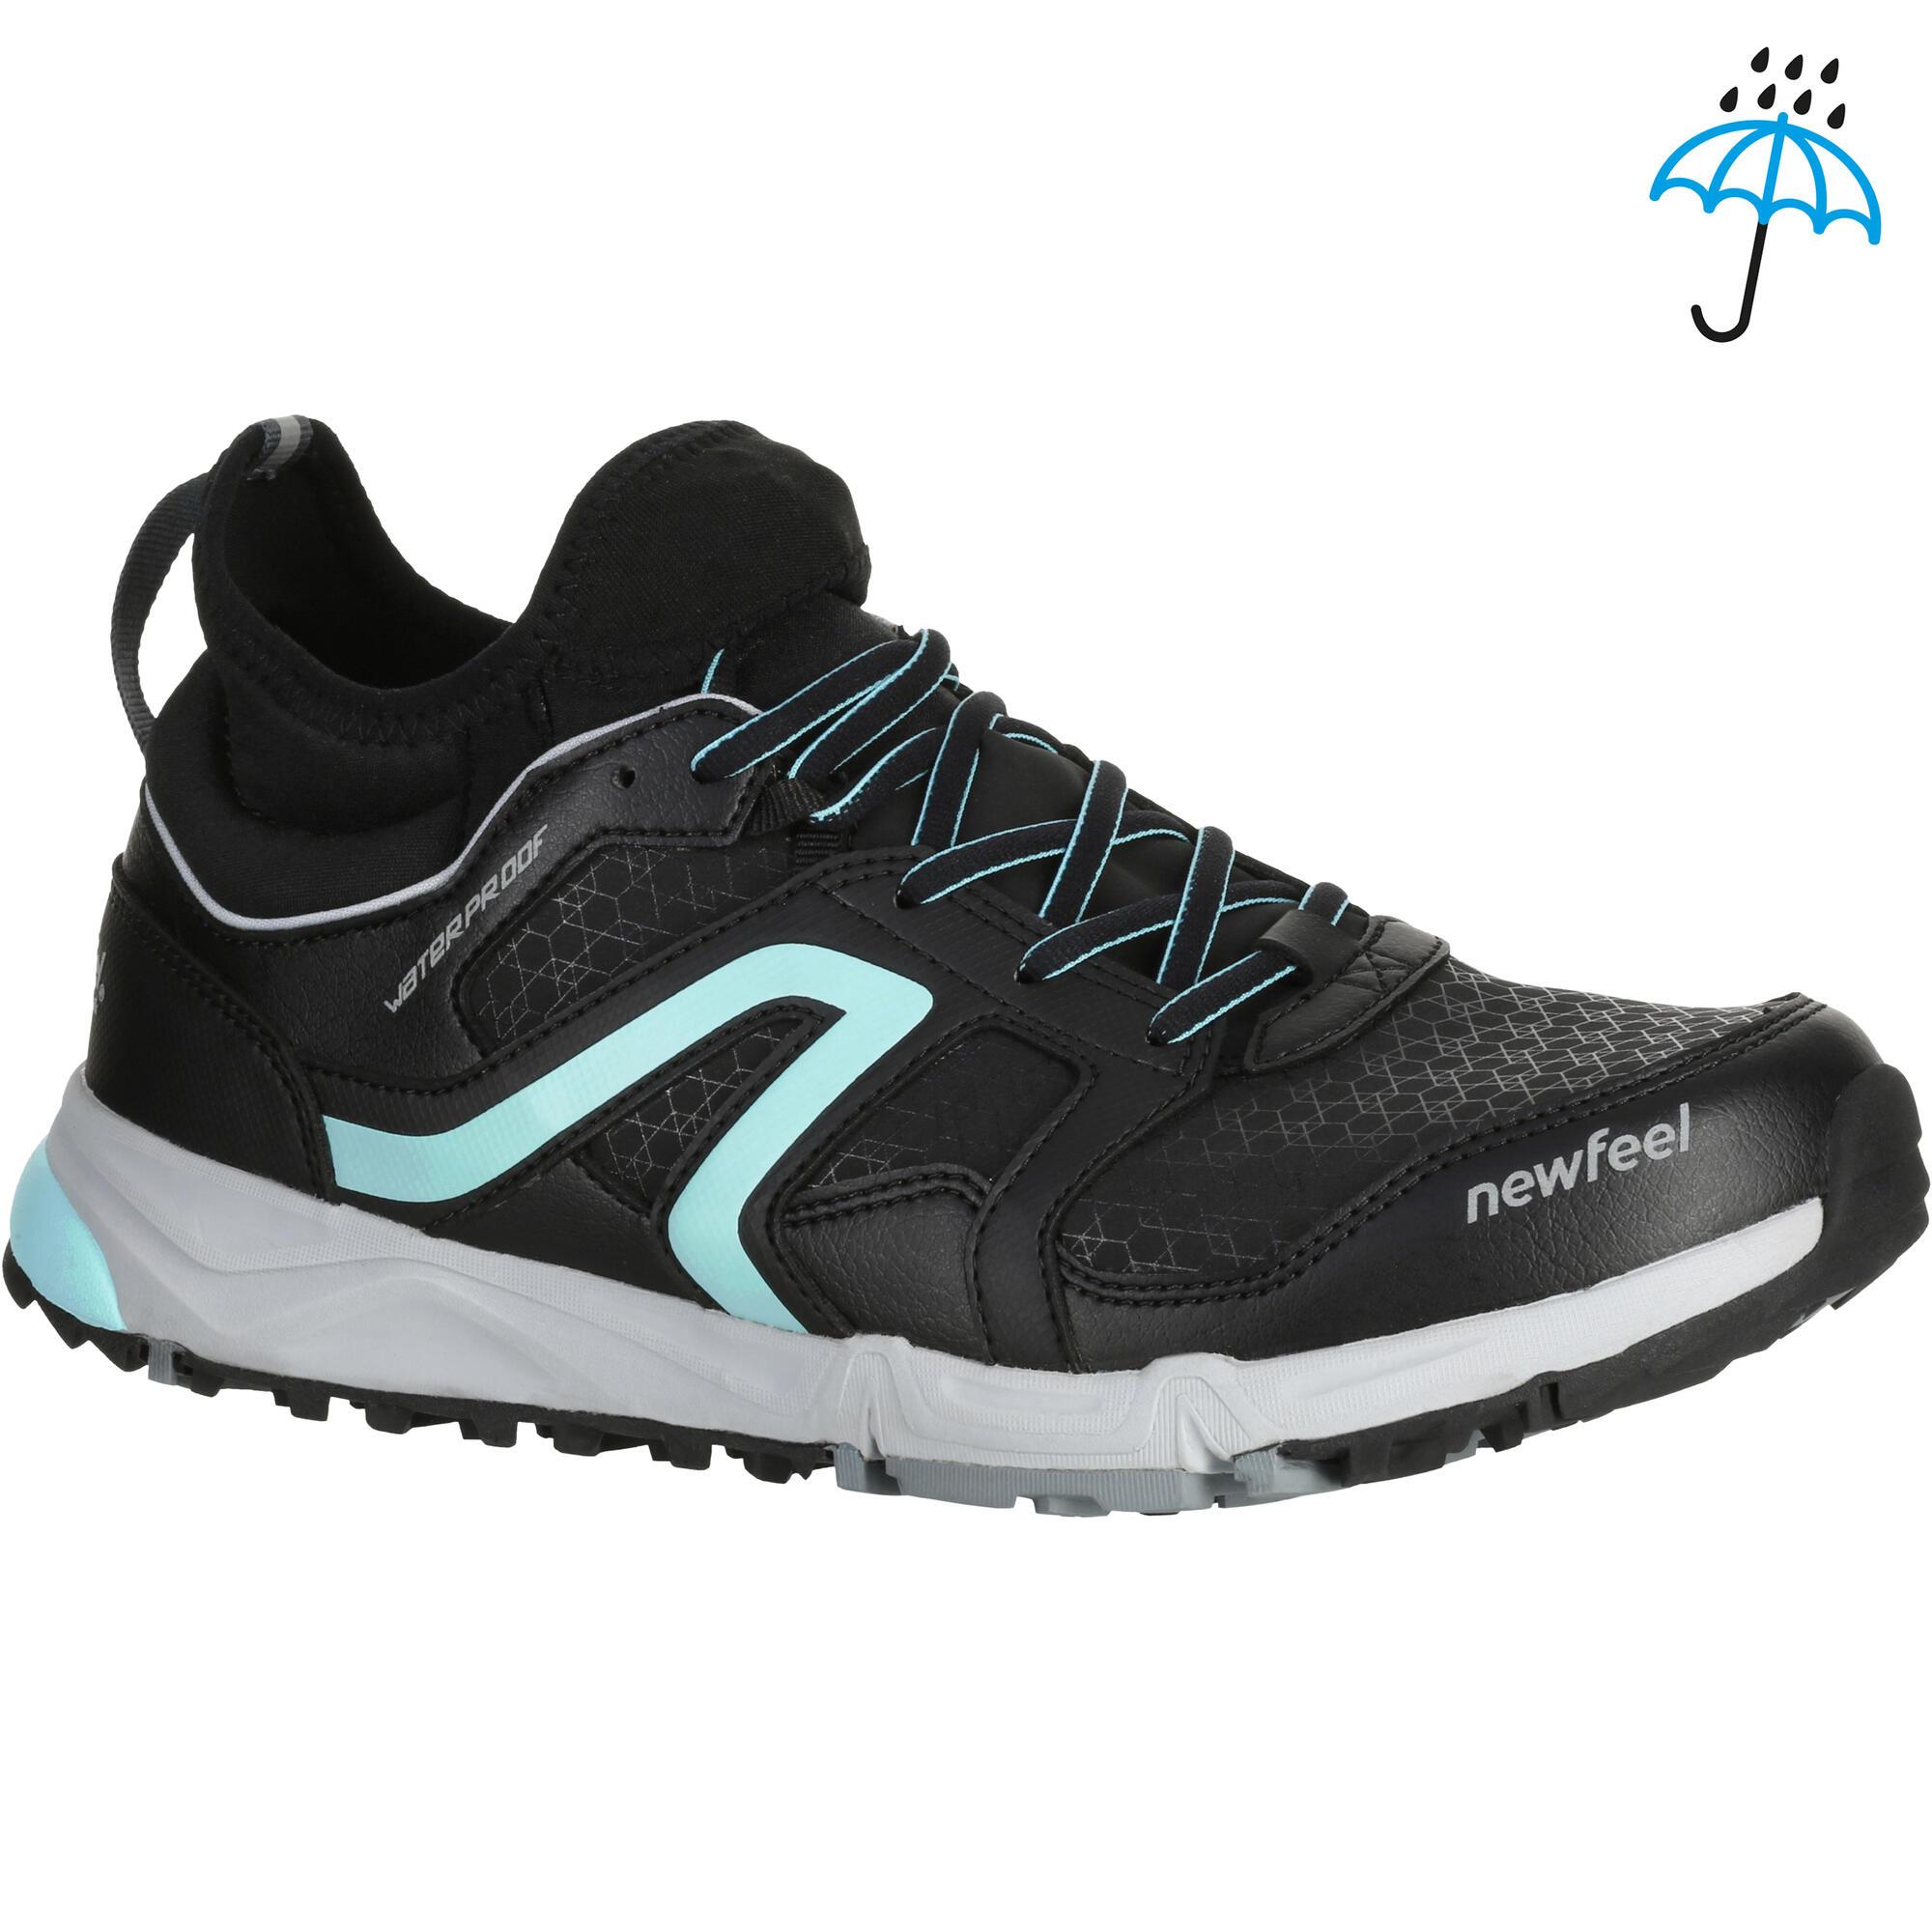 chaussures marche nordique femme nw580 noir bleu newfeel. Black Bedroom Furniture Sets. Home Design Ideas